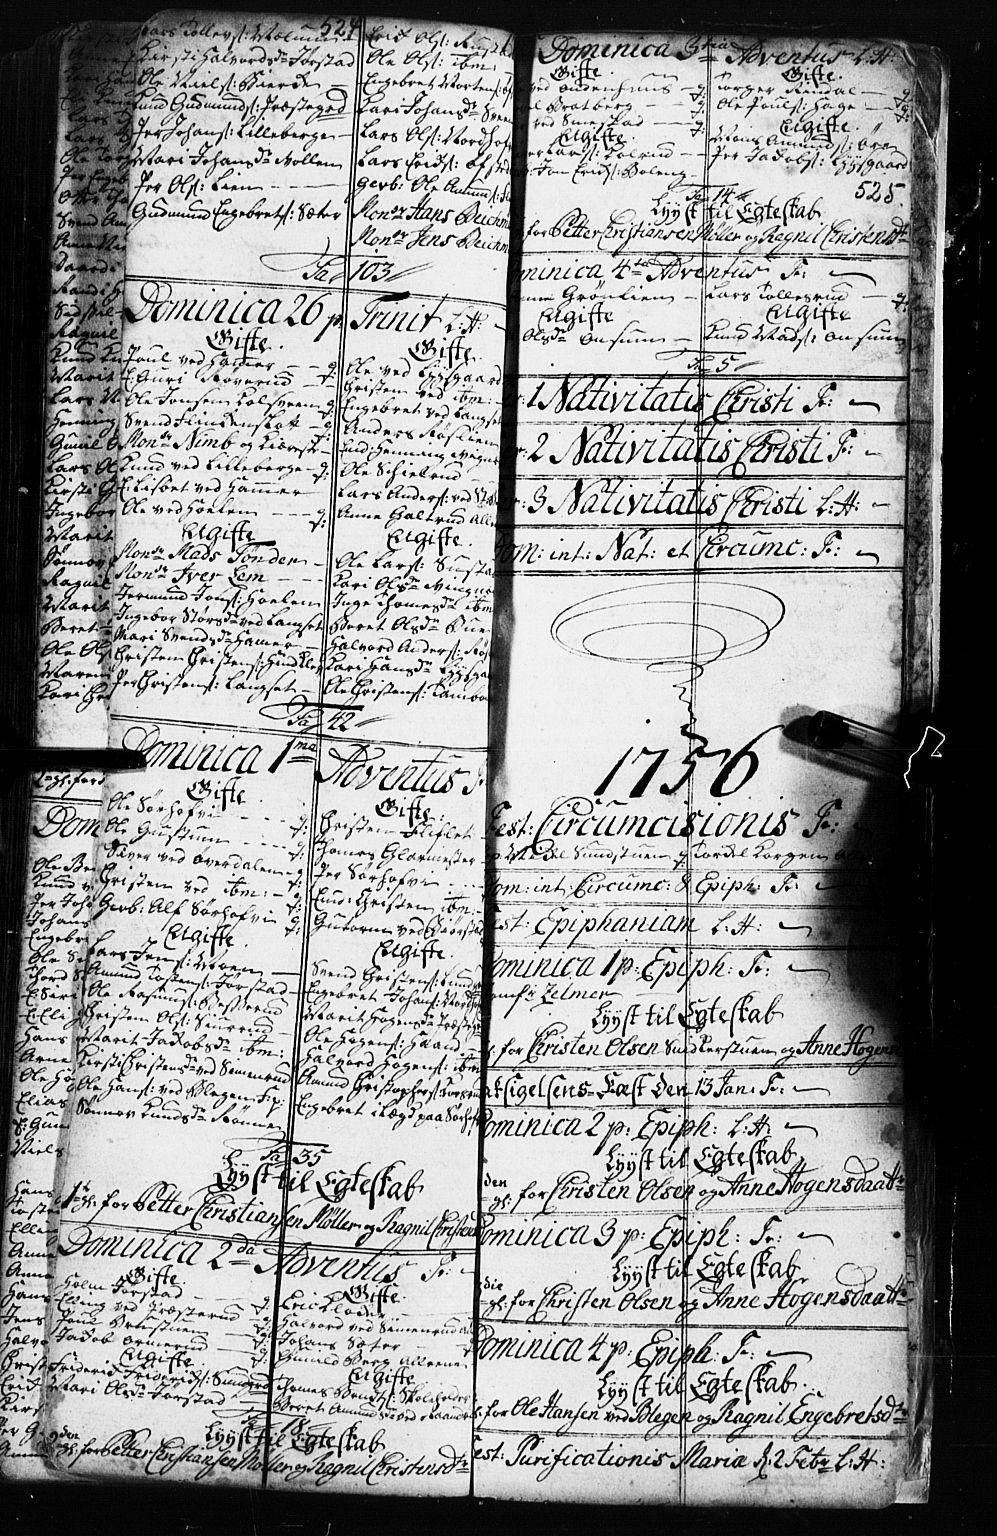 SAH, Fåberg prestekontor, Klokkerbok nr. 2, 1741-1756, s. 524-525